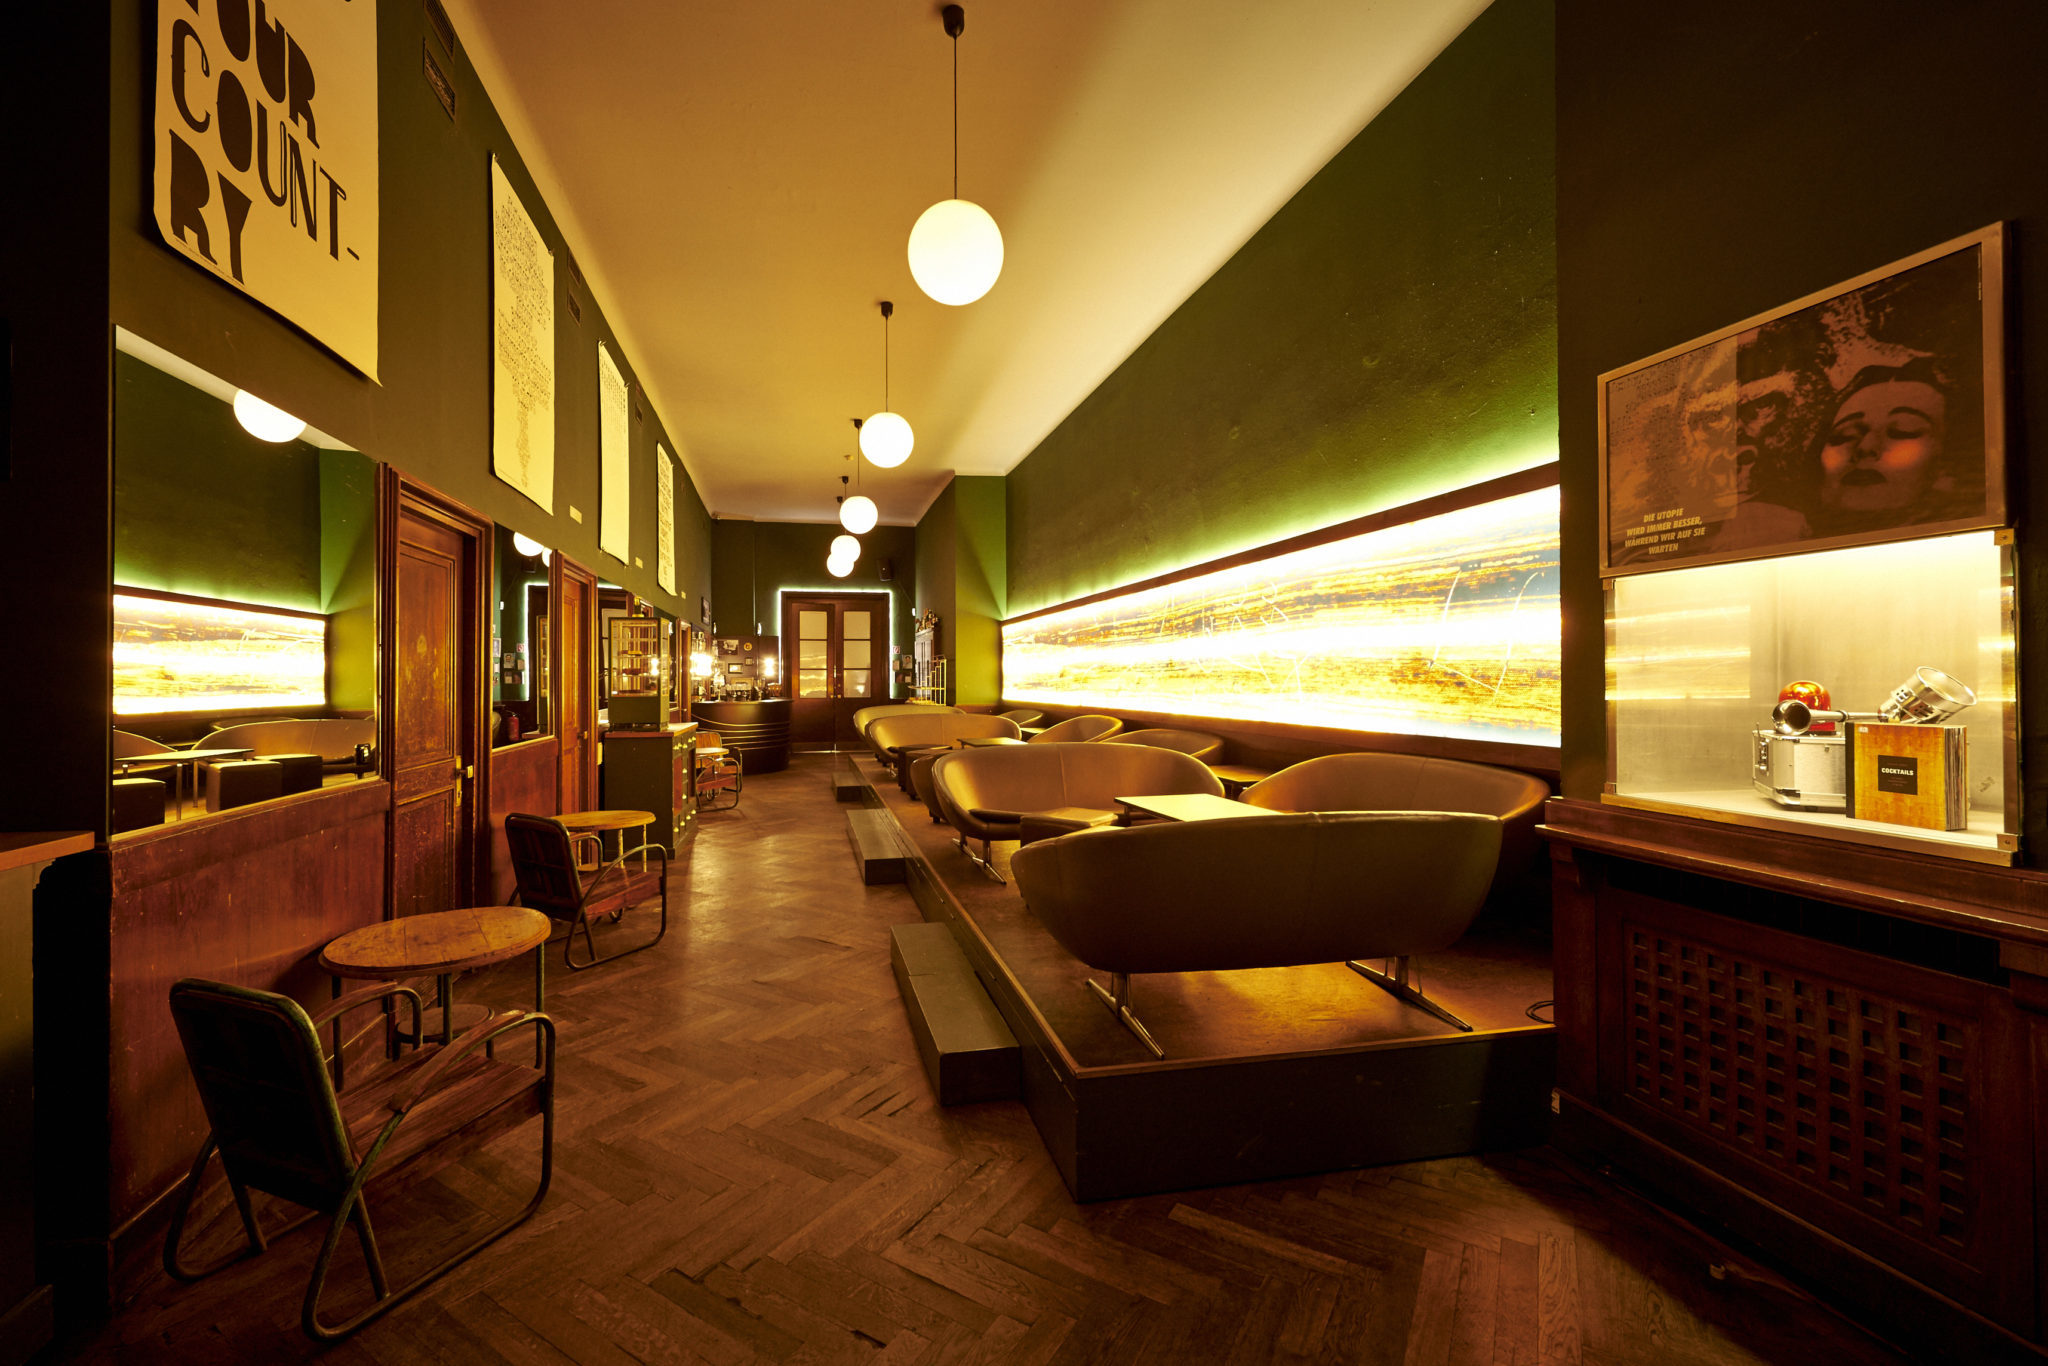 BAR & CLUB_  DIE GOLDENE BAR.  #Bar #Style #FineDesign   http://www.goldenebar.de